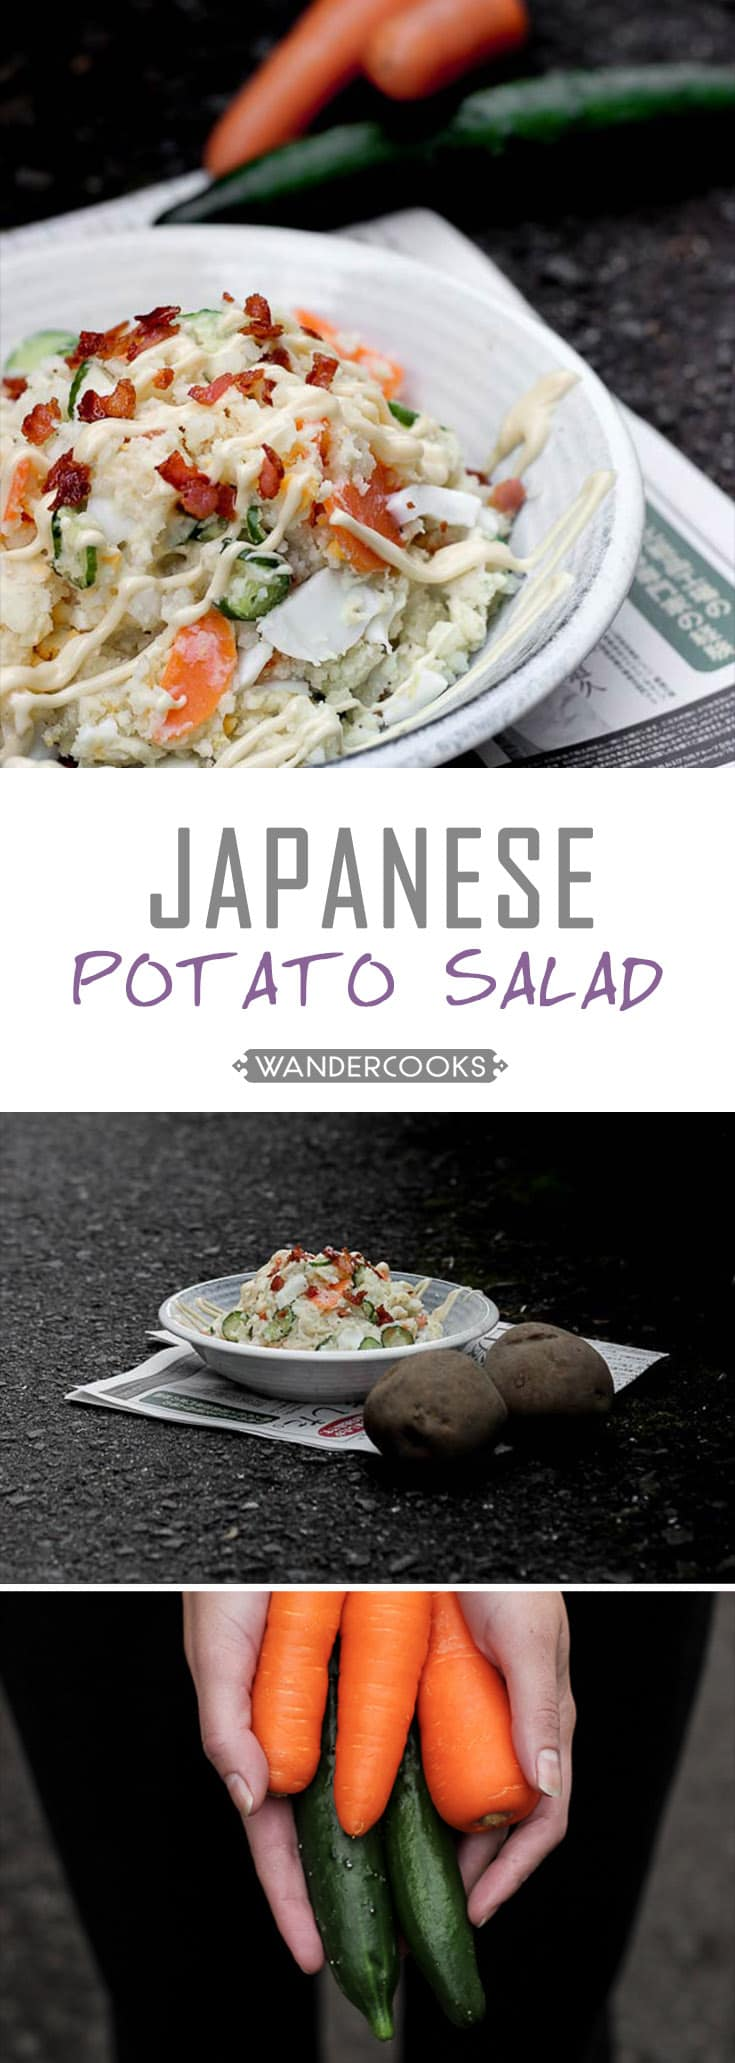 Creamy japanese potato salad wandercooks creamy japanese potato salad an authentic easy home style japanese recipe with egg and forumfinder Choice Image